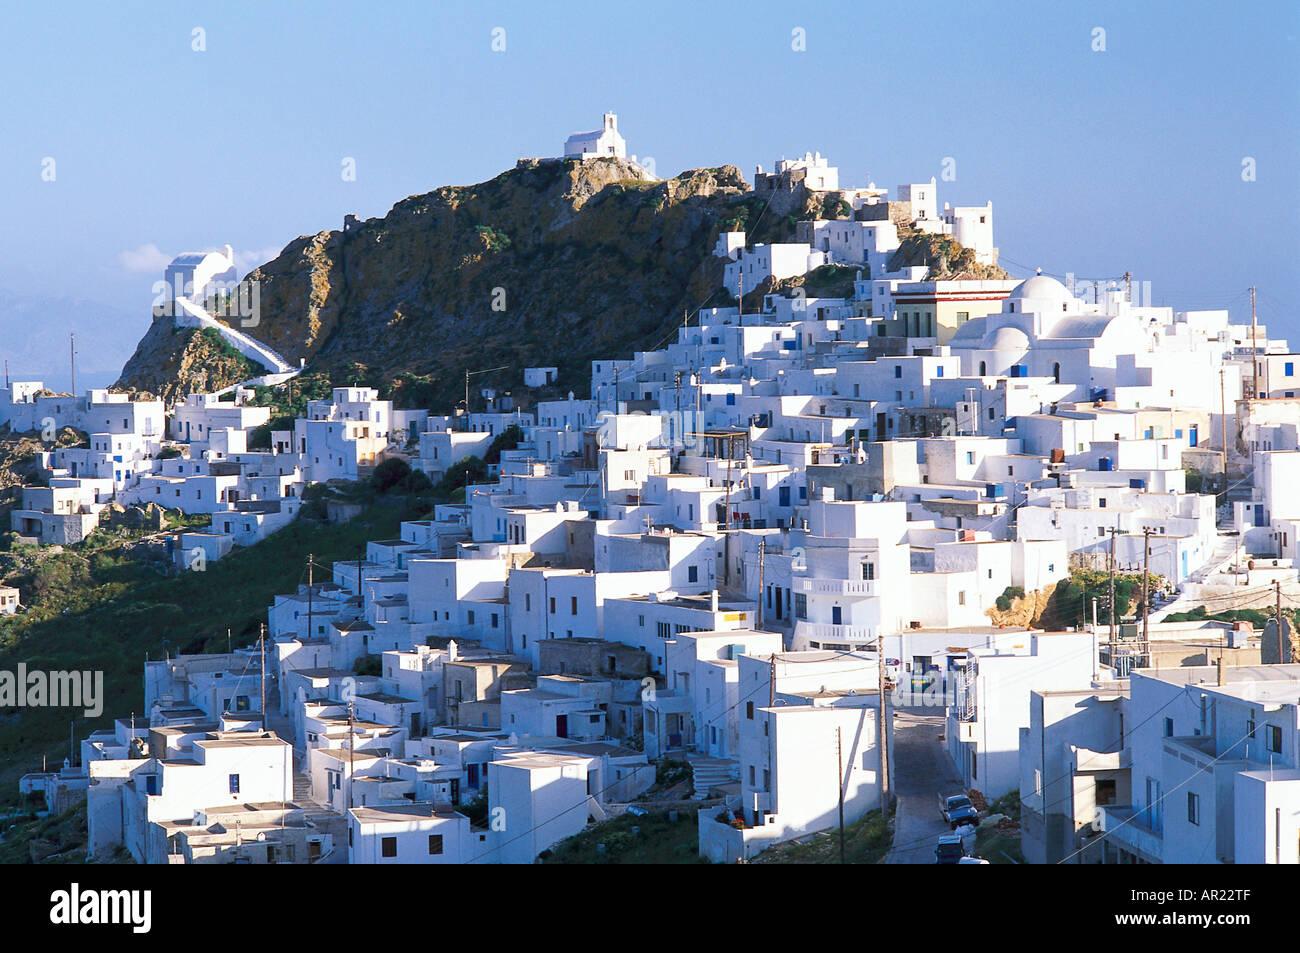 White houses, Agios Konstantinos, Chora, Serifos, Cyclades, South Aegean, Greece - Stock Image